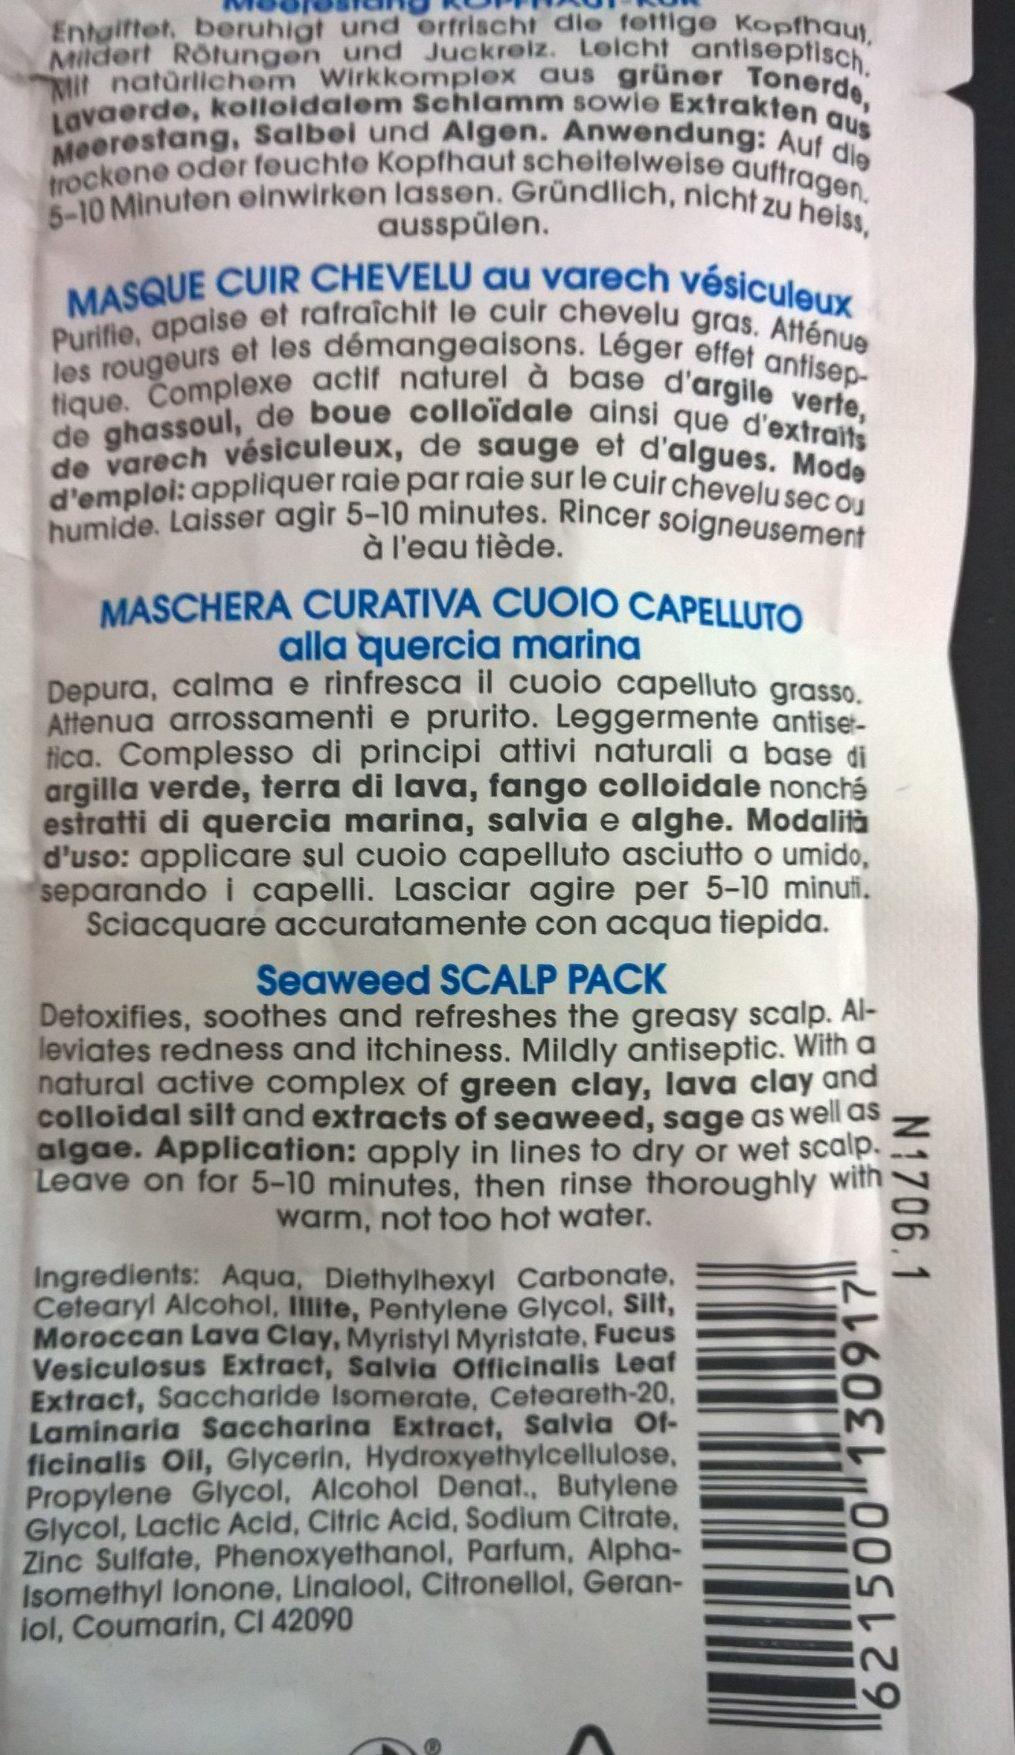 RAUSCH Meerestang Kopfhaut-Kur - Ingredients